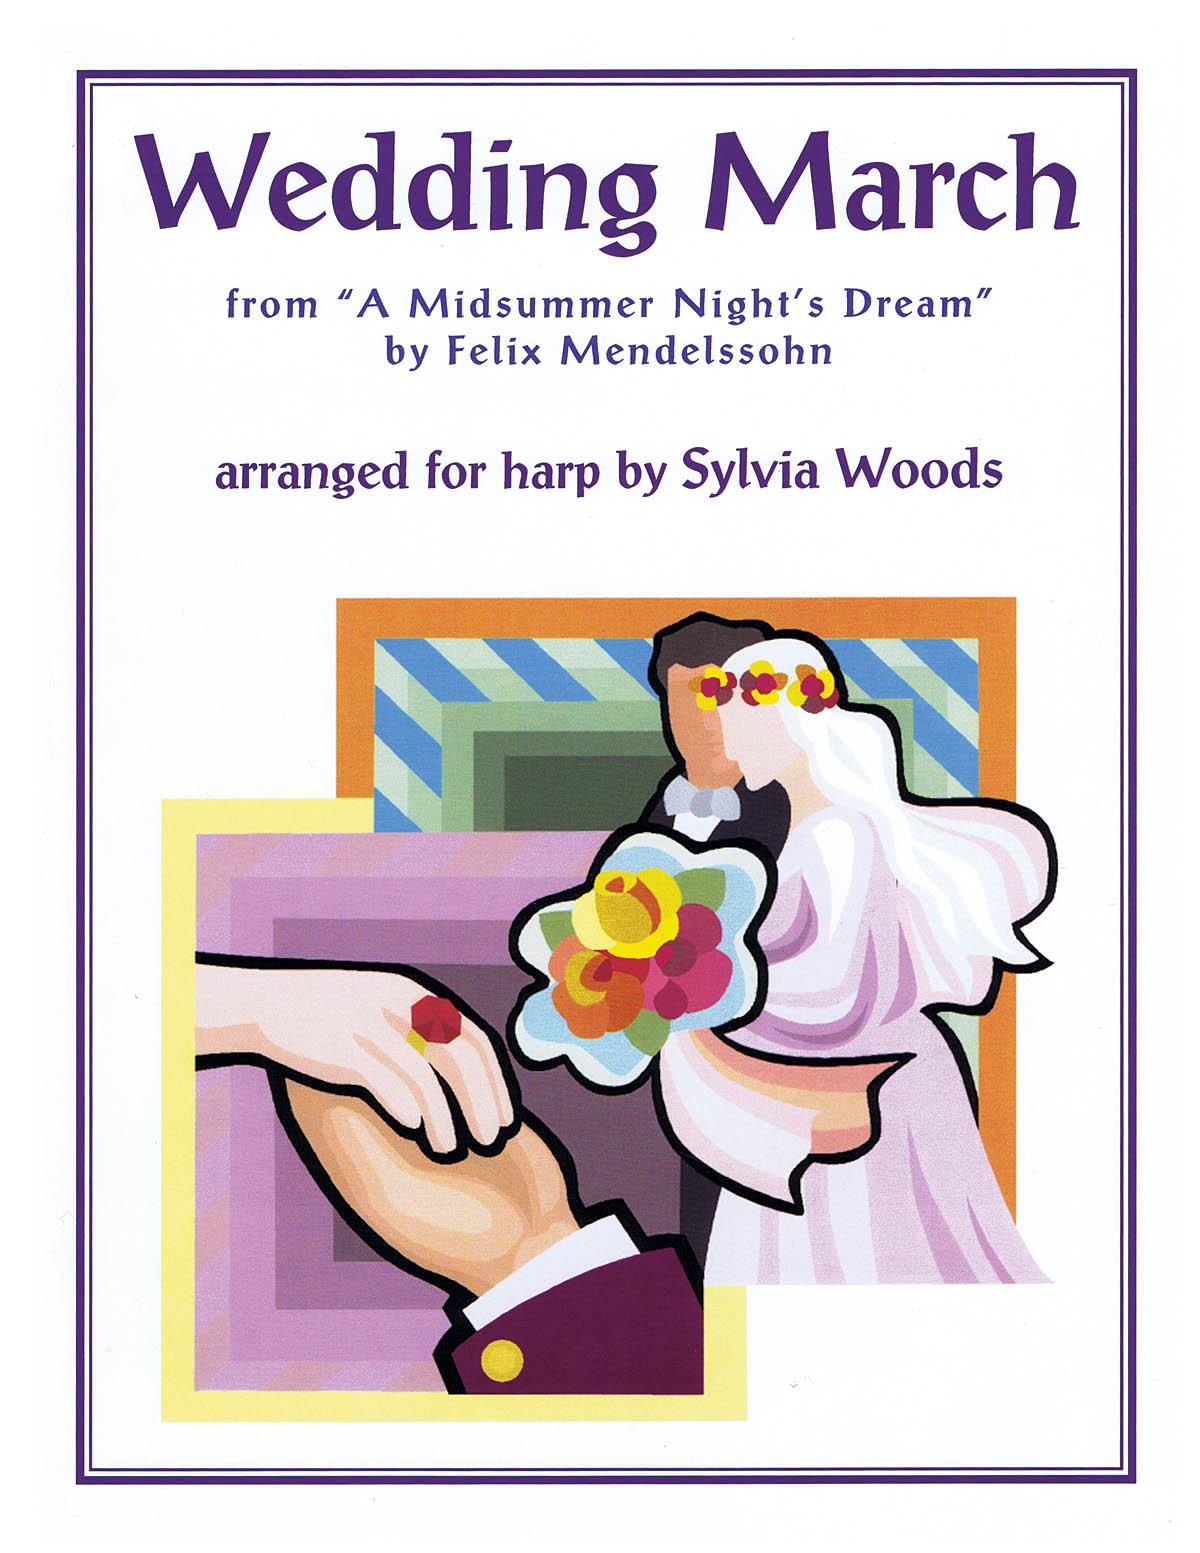 Felix Mendelssohn Bartholdy: Wedding March From A Midsummer's Night Dream: Harp